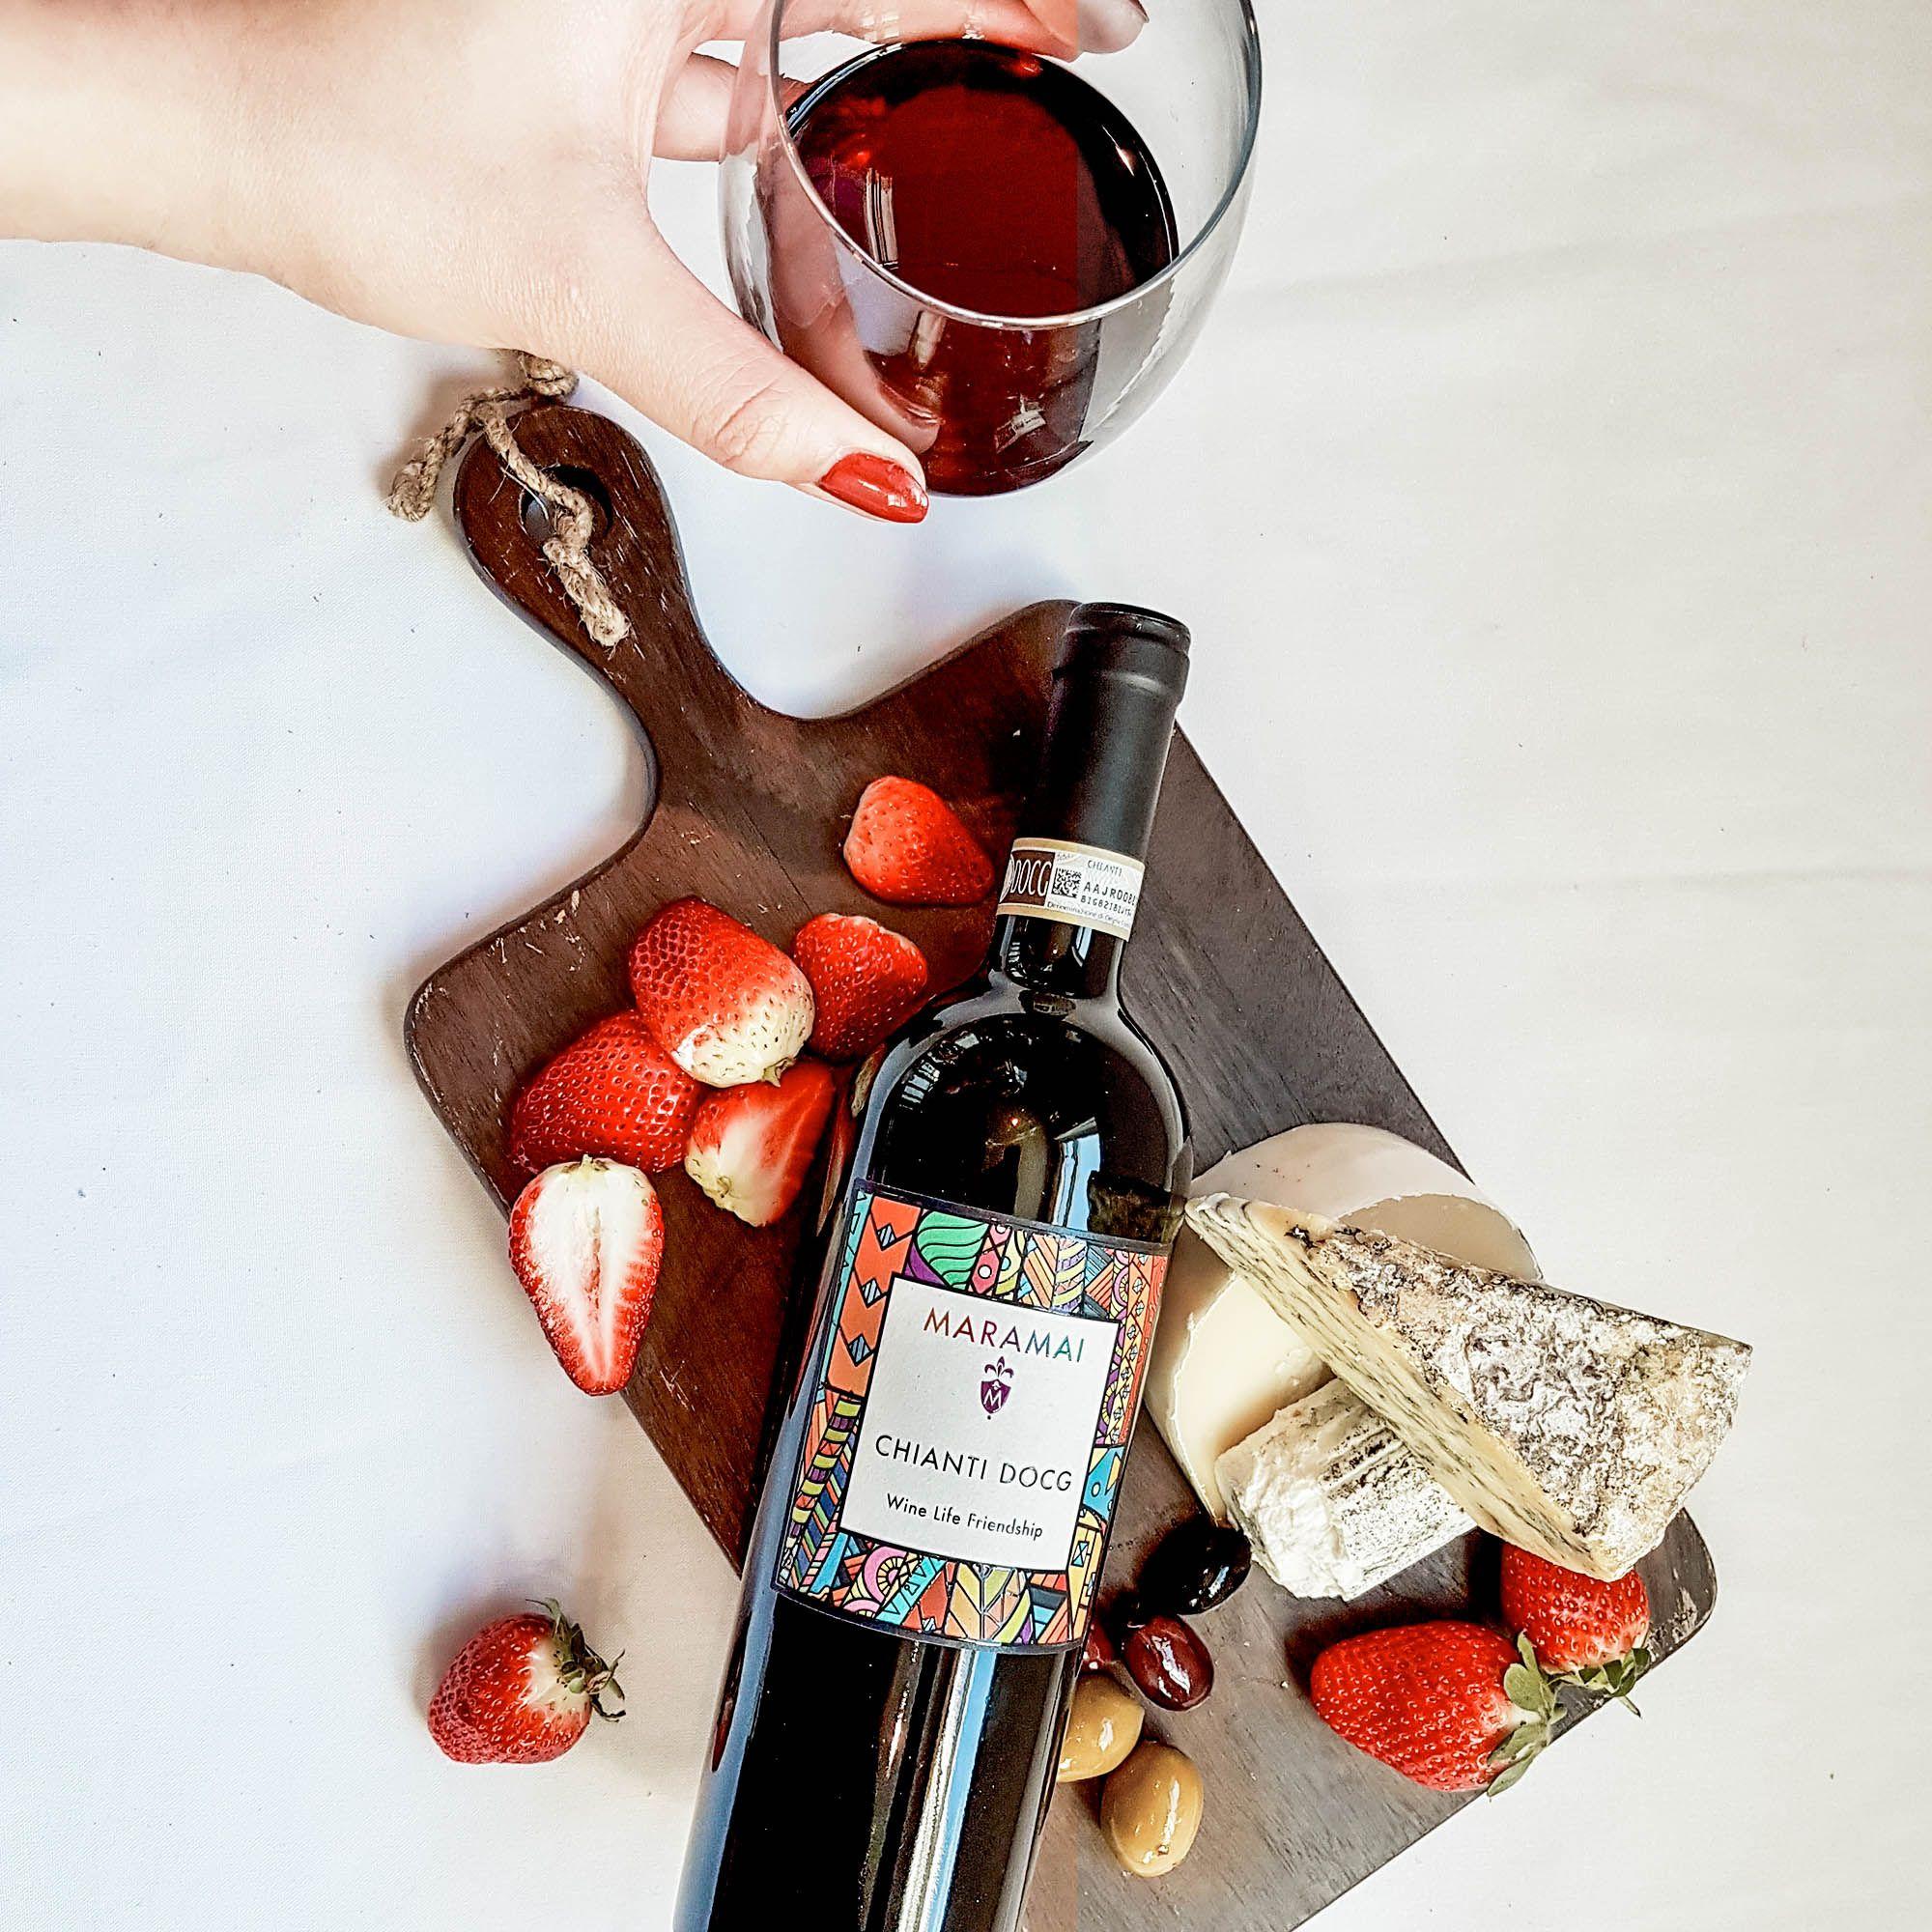 2015 Maramai Tuscany Chianti Docg Vino Vinograd